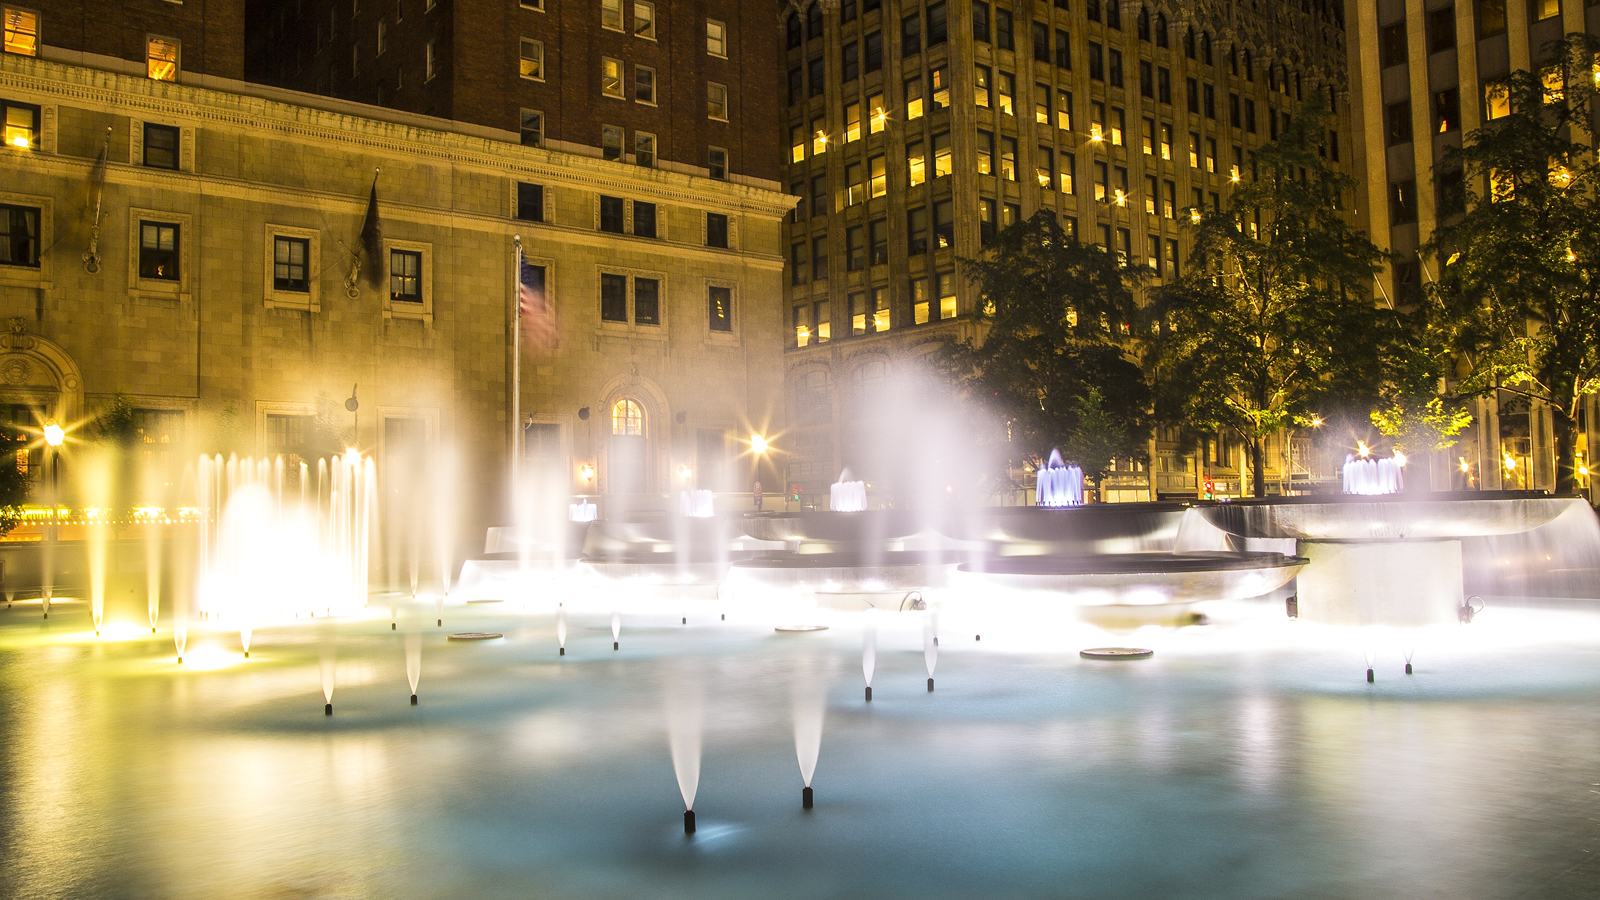 PA_Pittsburgh_MellonSquare_signature_copyrightJohnAltdorfer_2014_03.jpg